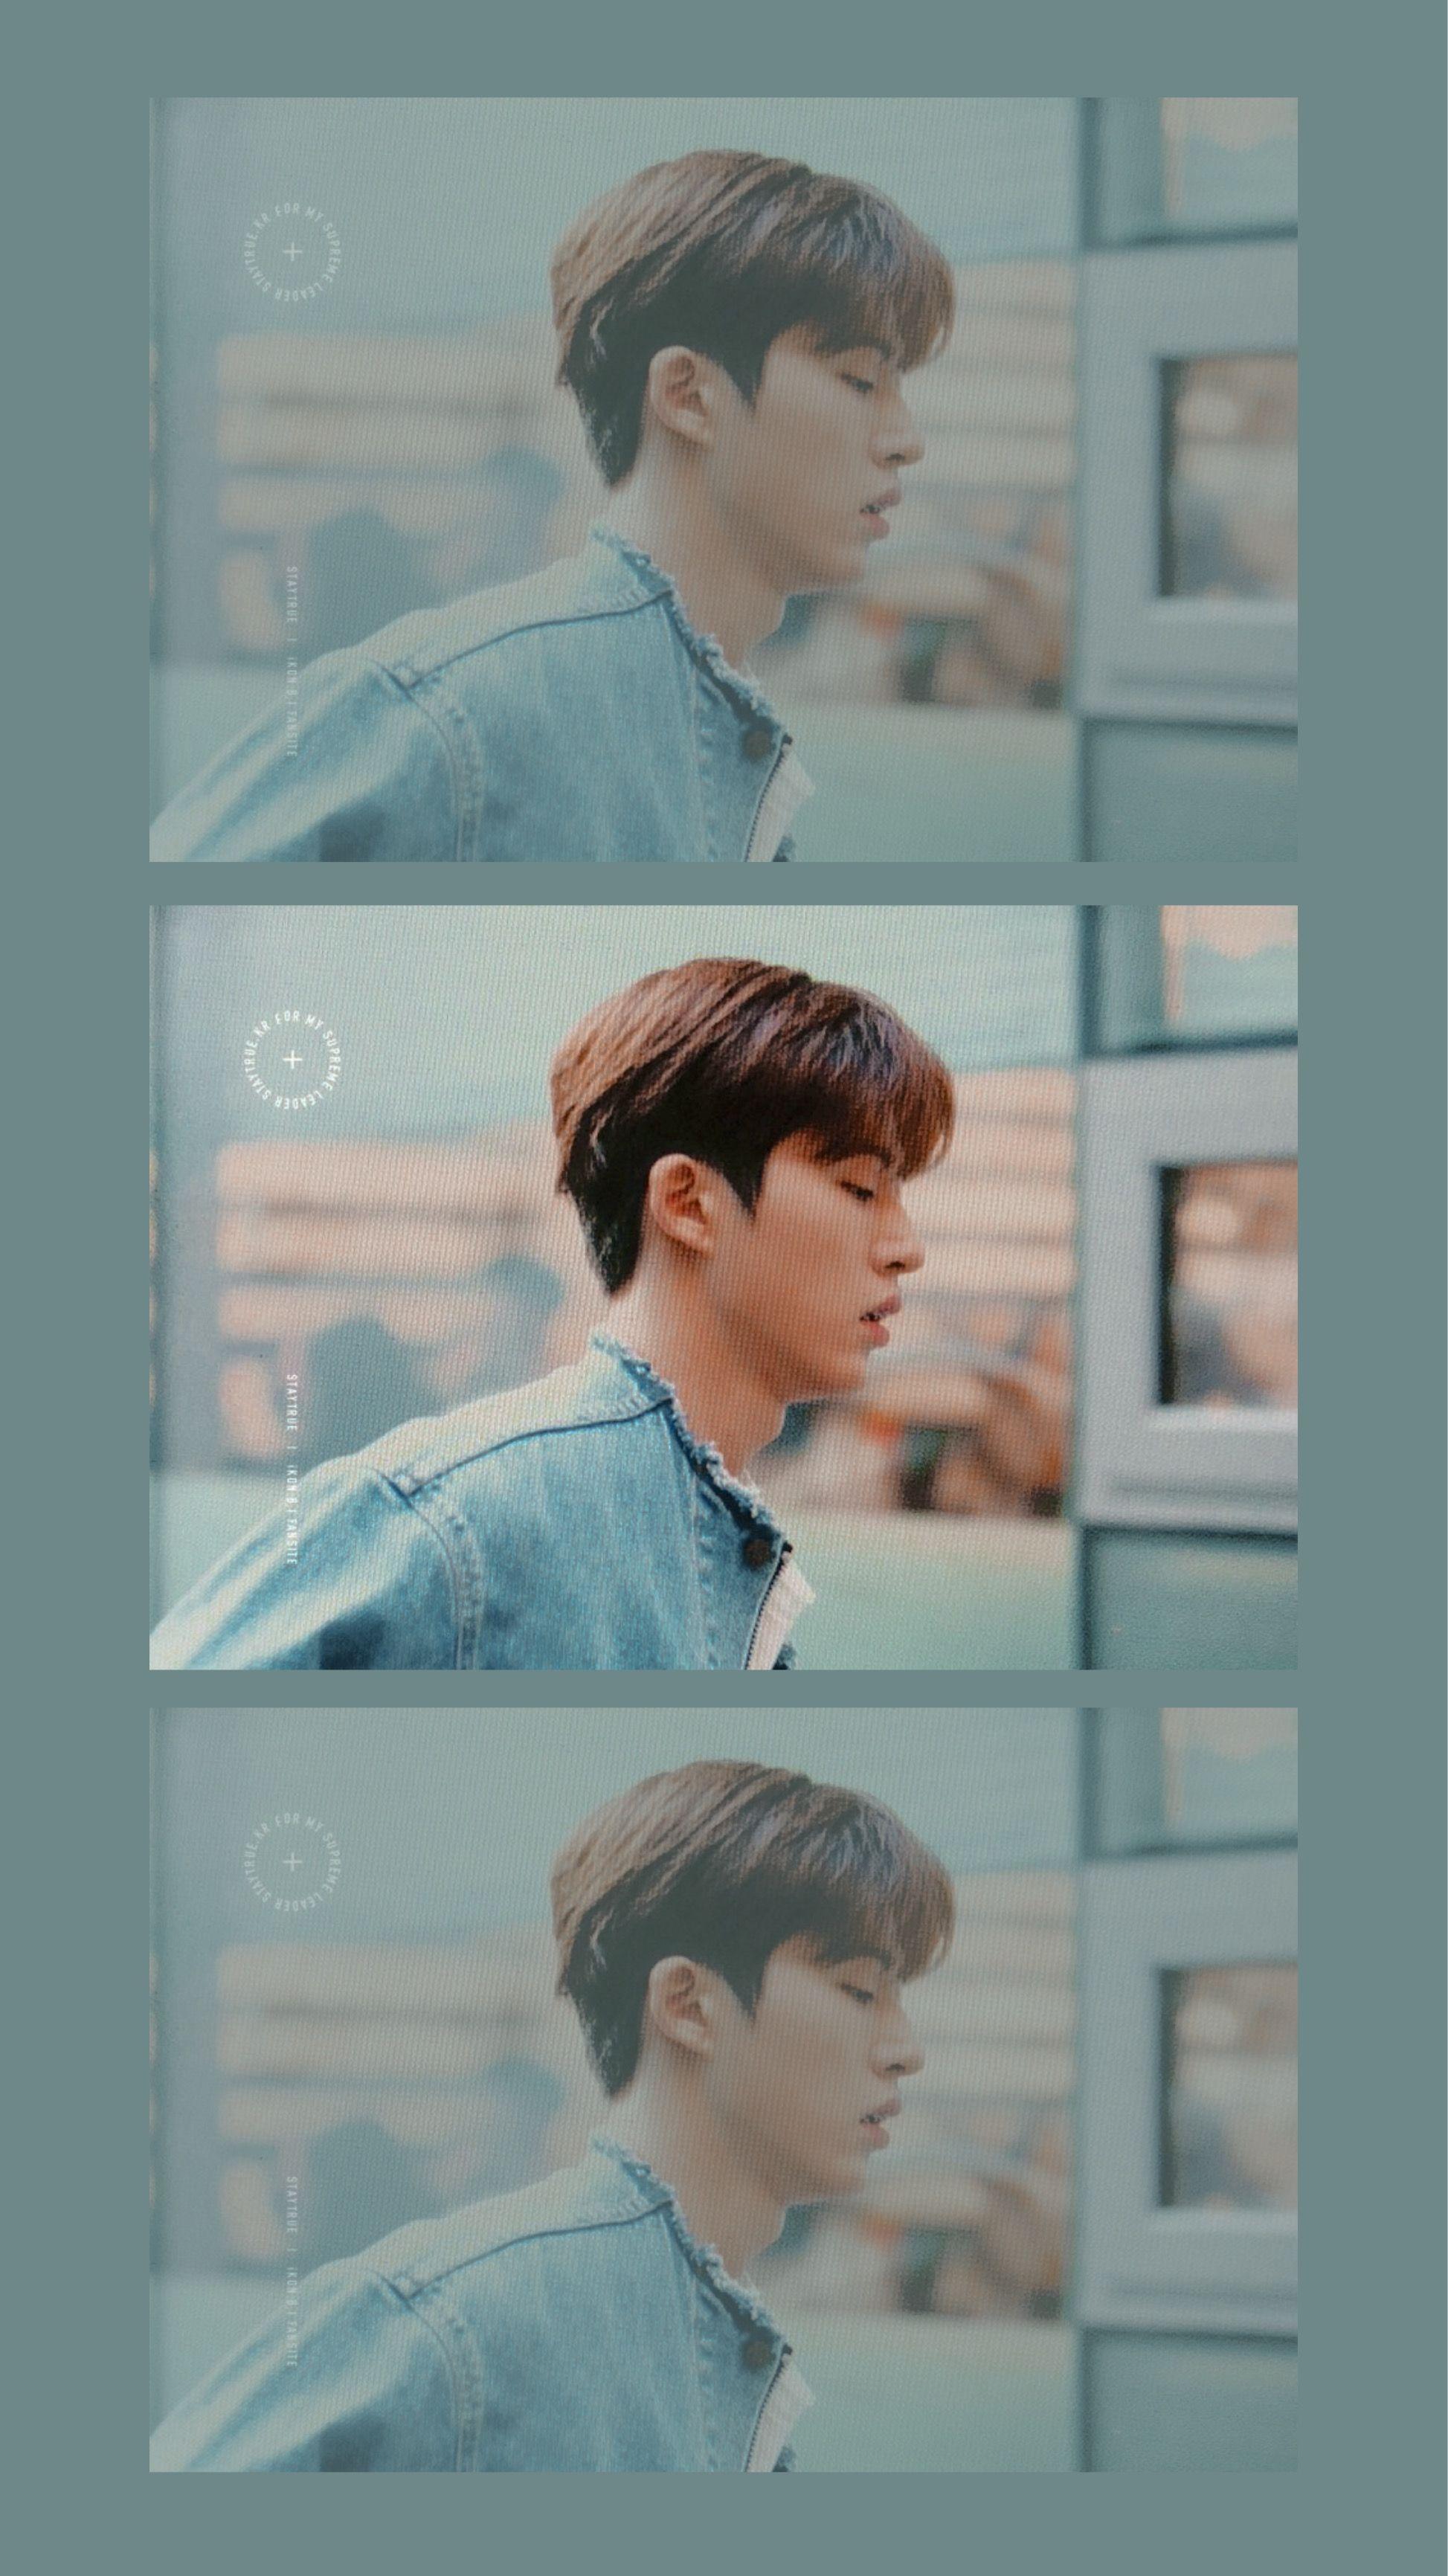 Hanbin Ikon Edited By Biairago Kimhanbin Bi Kimjinhwan Jinhwan Jay Kimjiwon Bobby Songyunhyeong Yunhyeong Koojunhoe Fotografi Selebritas Bobby Aesthetic ikon hanbin wallpaper